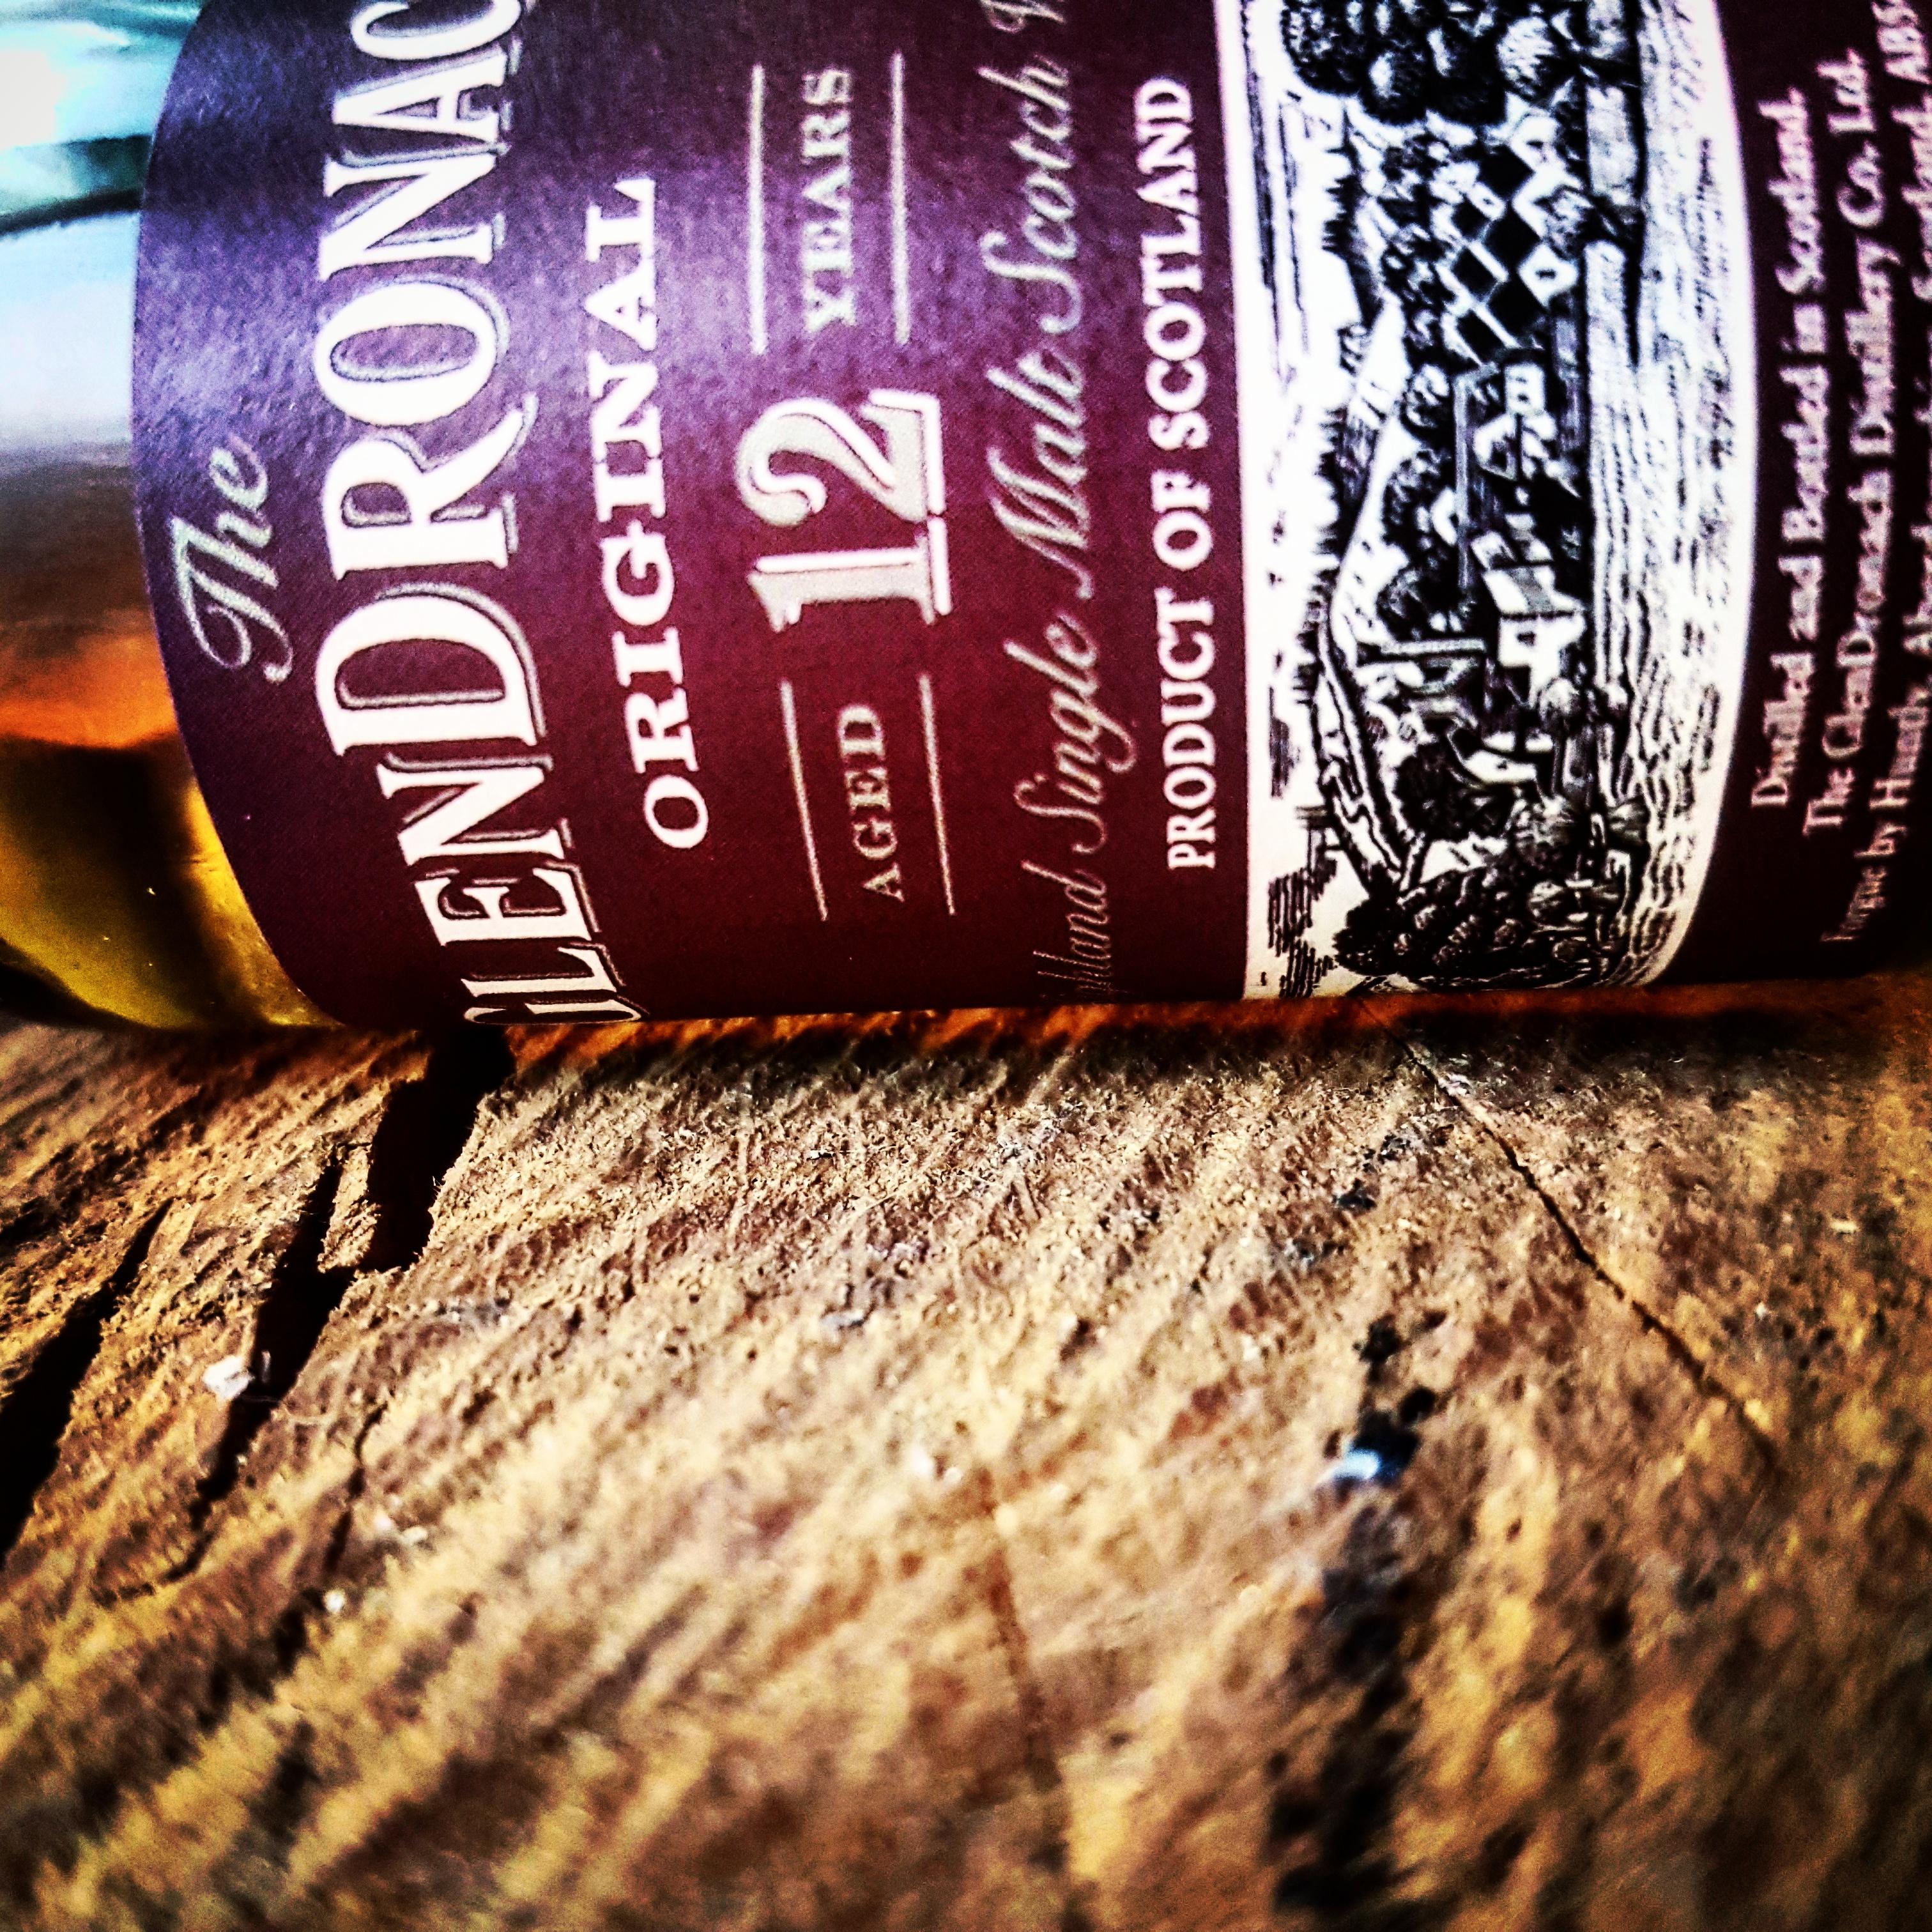 The GlenDronach Original 12 Jahre Highland Single Malt Scotch Whisky